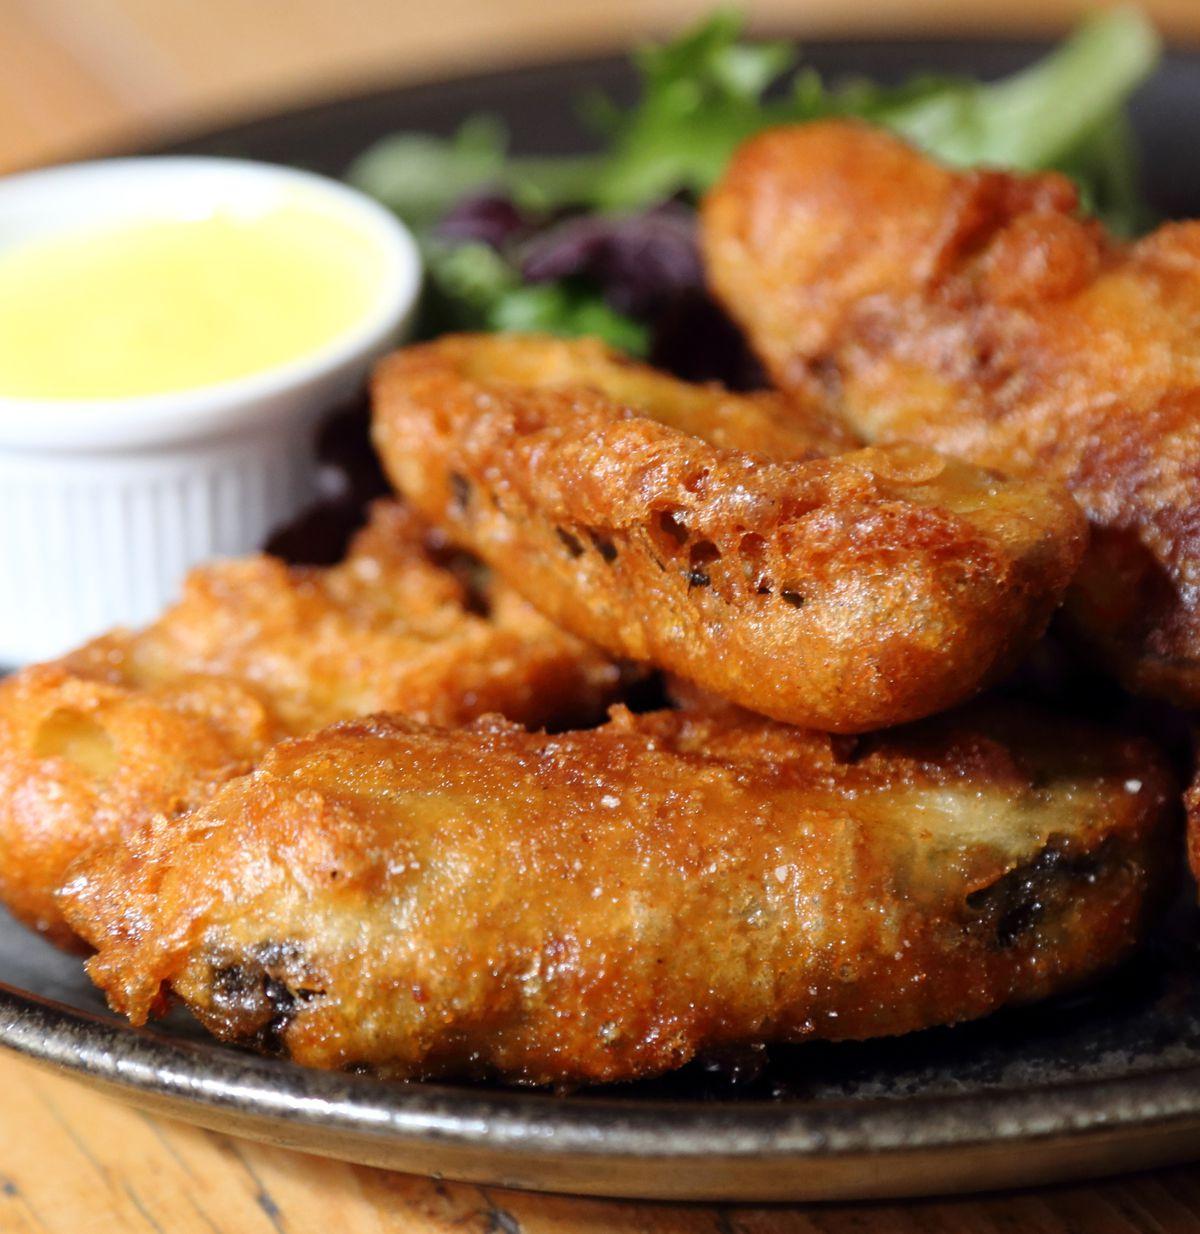 Chicken strips; deep fried tender pieces